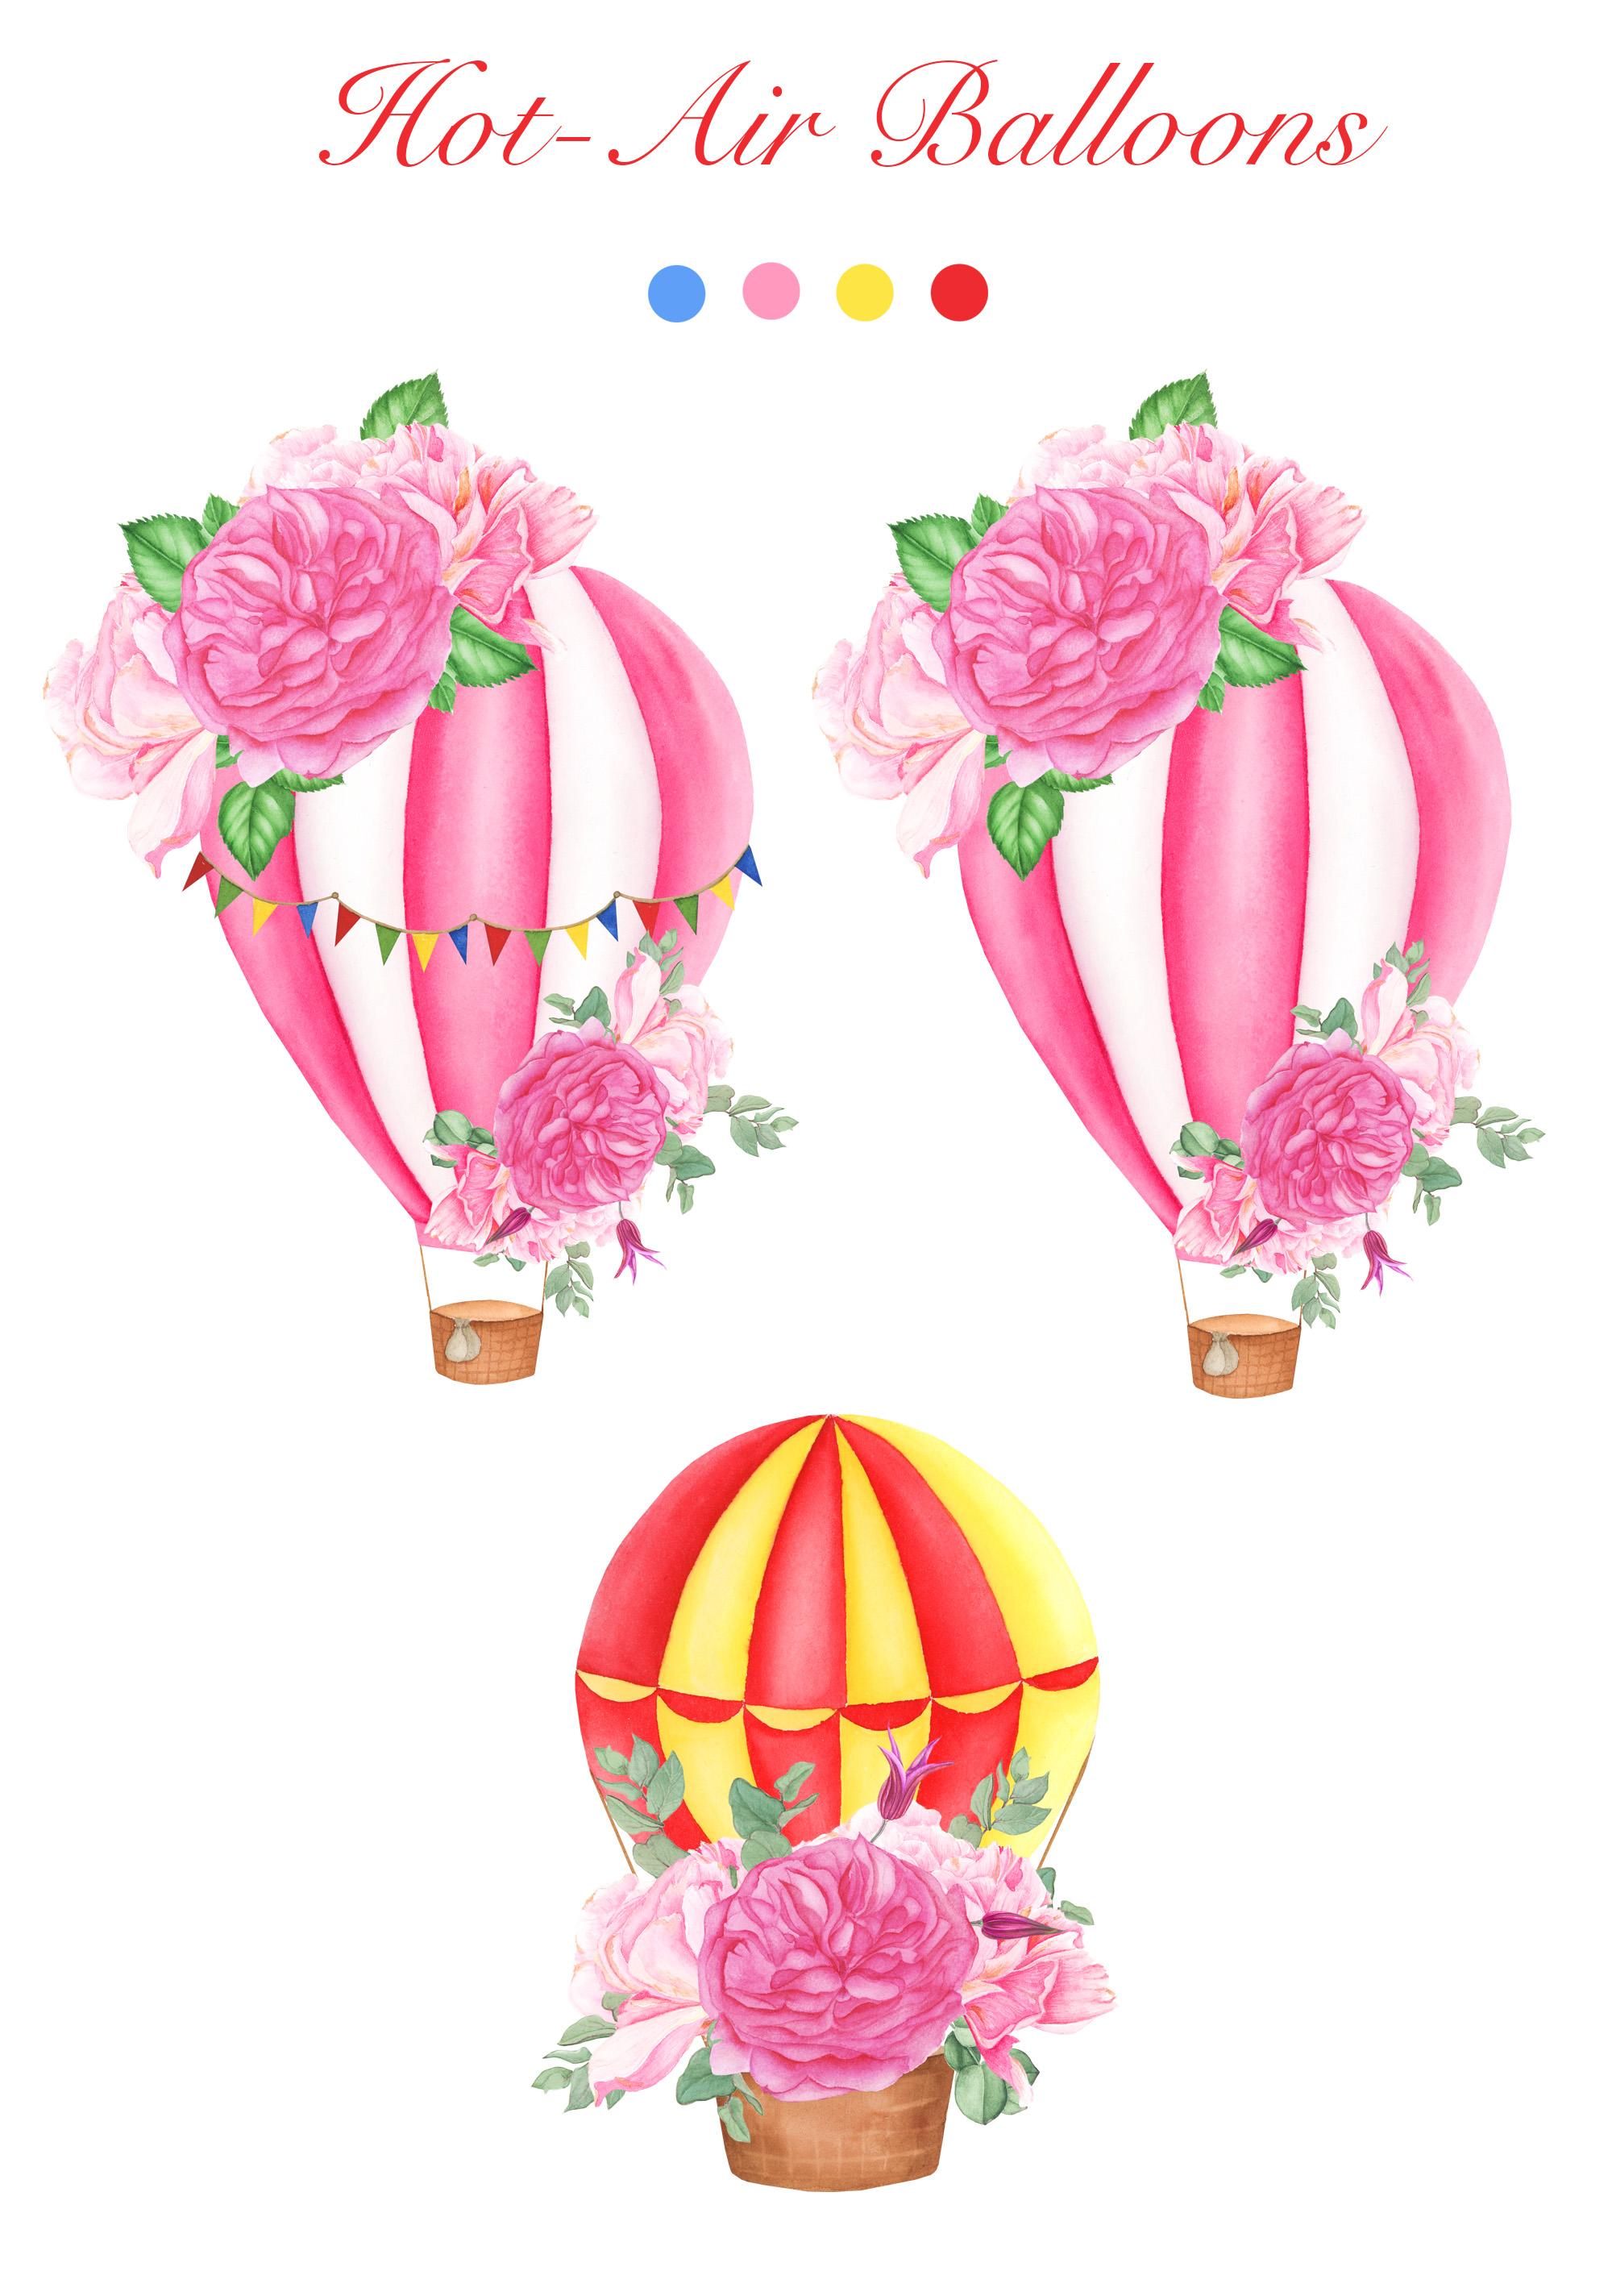 Watercolor Hot-Air Balloons Patterns example image 9